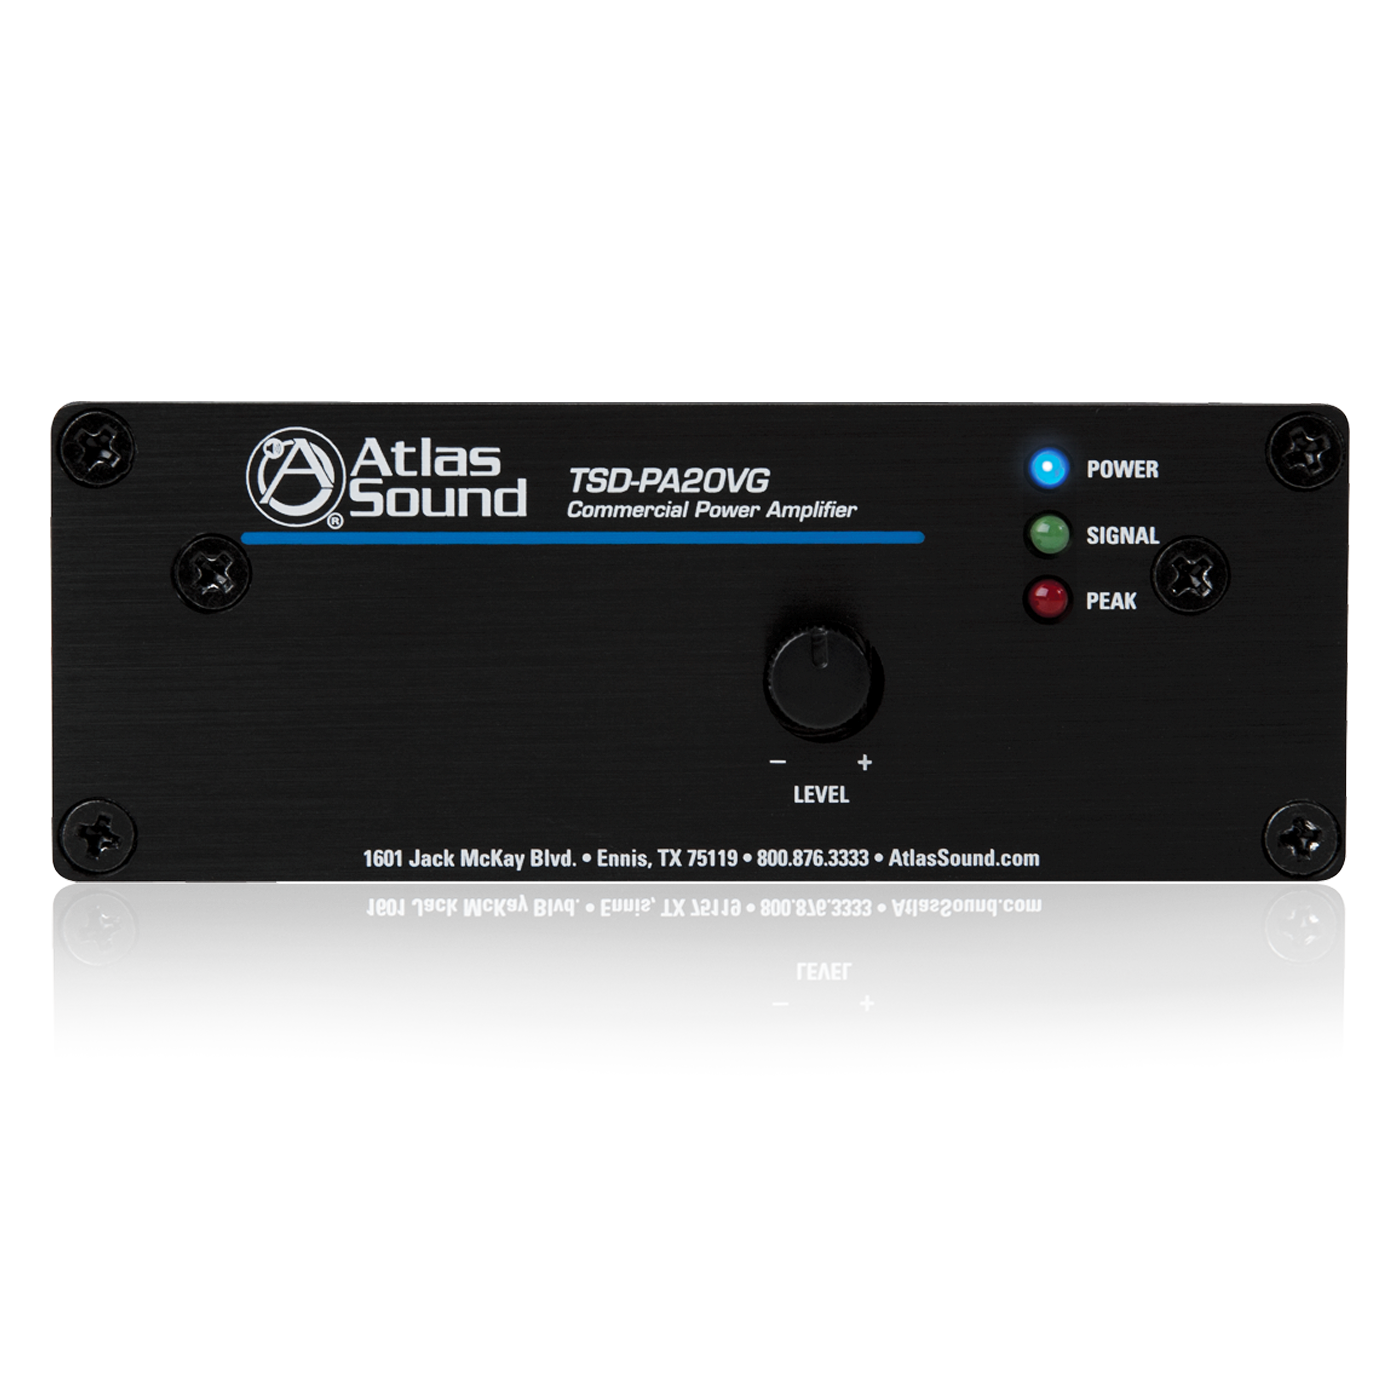 93 20 Watt Stereo Amp Blackstar Idcore 2x10w Combo 20w Bridge Amplifier Using Tda7240a Schematic Design 1 Input 25v 70v 100v 4 Power